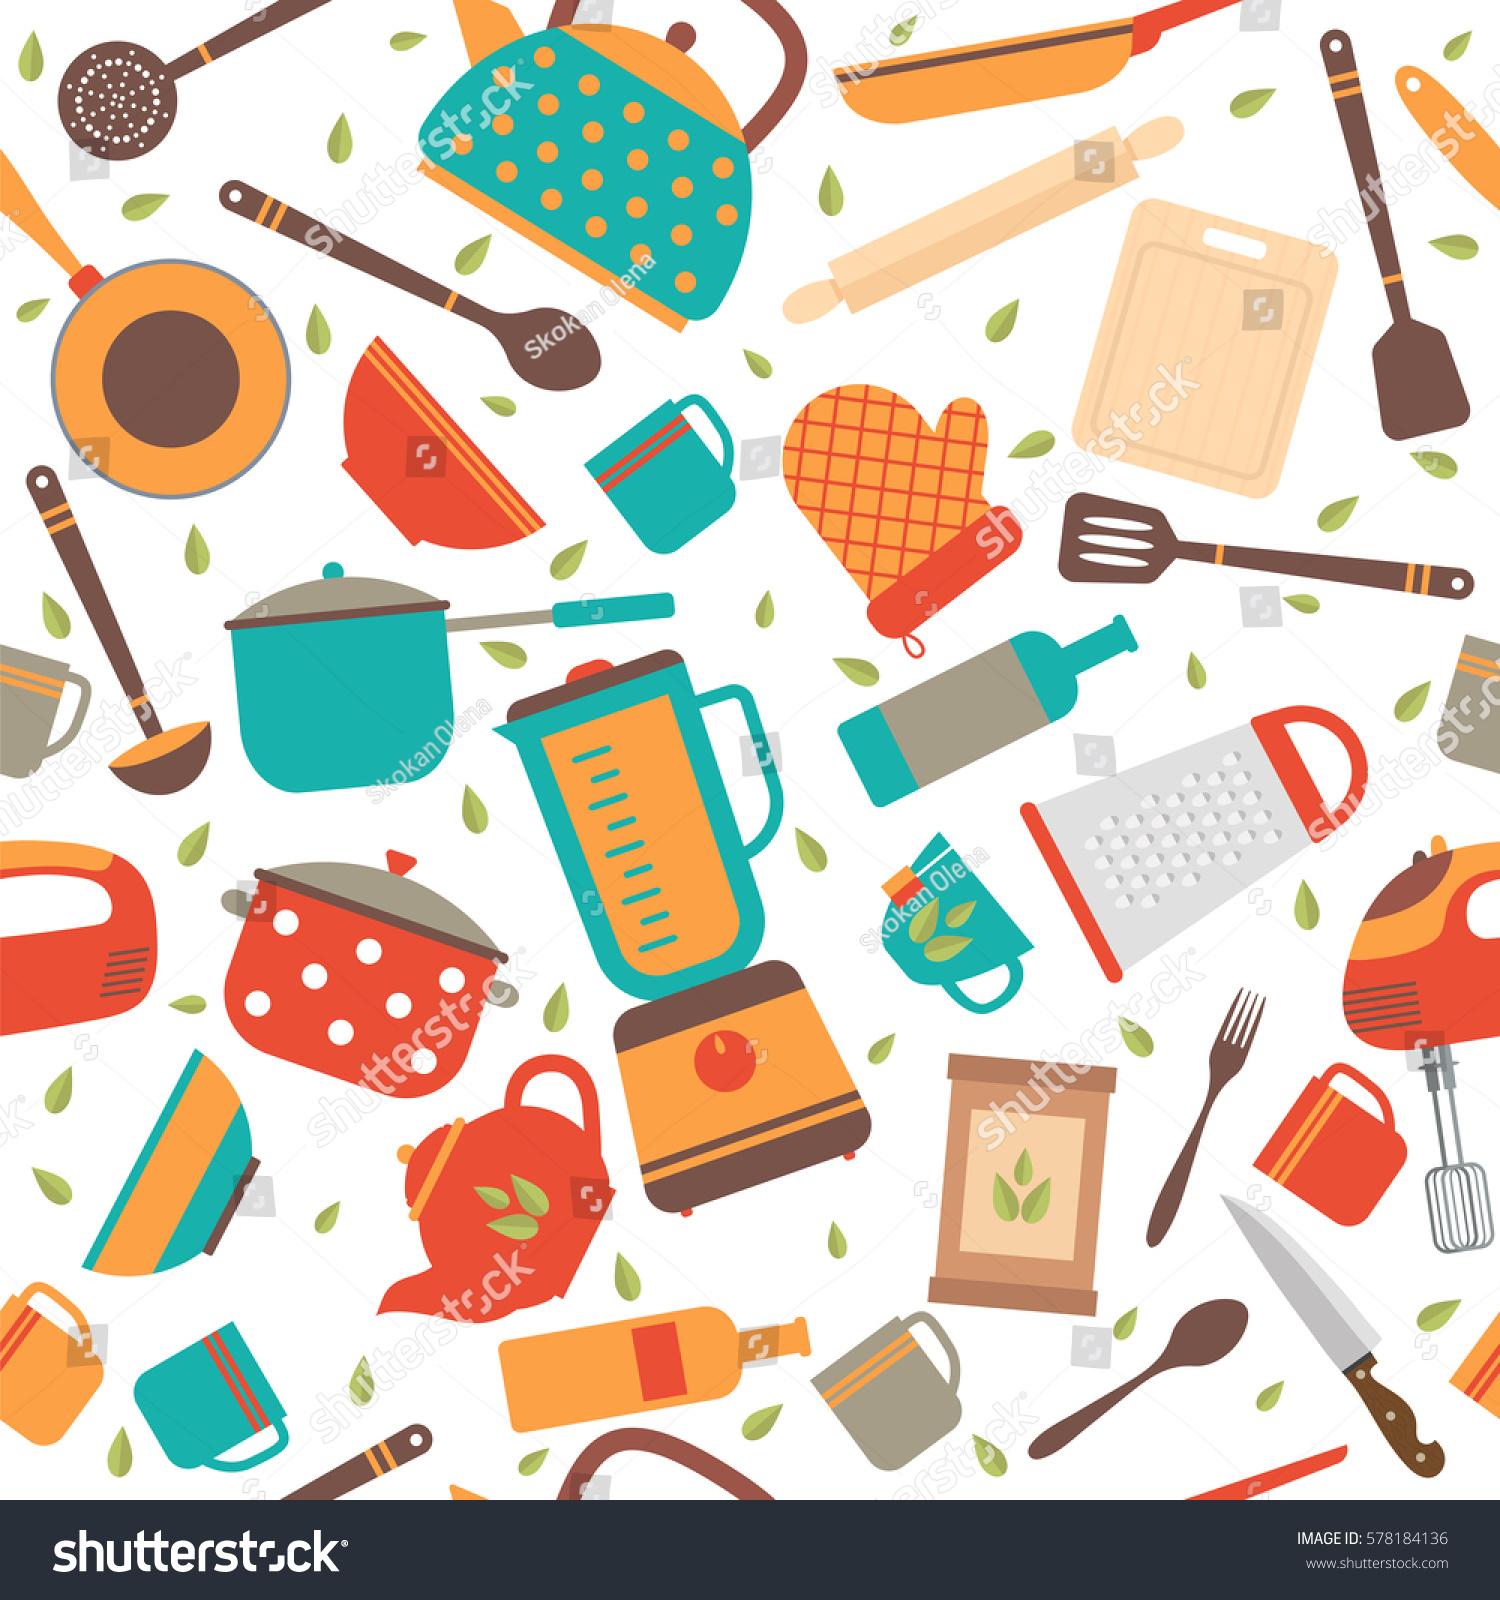 Kitchen Background Image: Seamless Pattern Kitchen Tools Cooking Utensils Stock